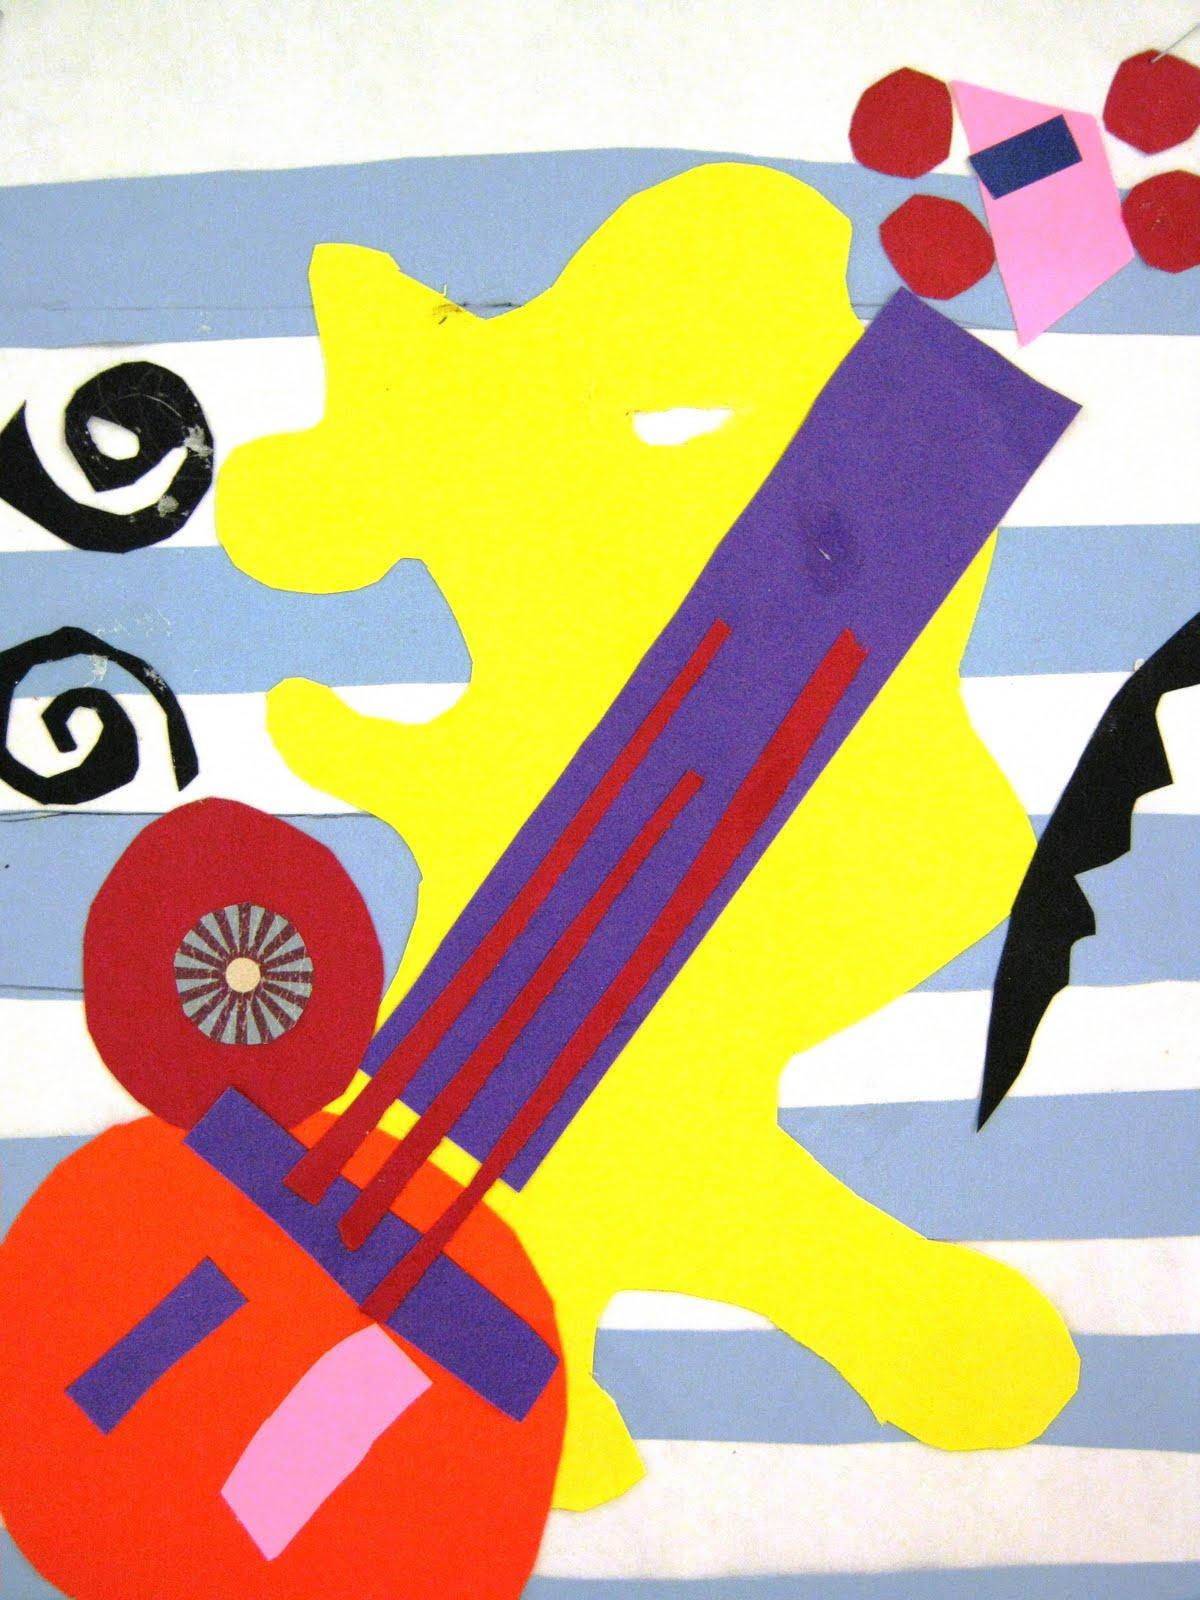 Matisse Collage Images